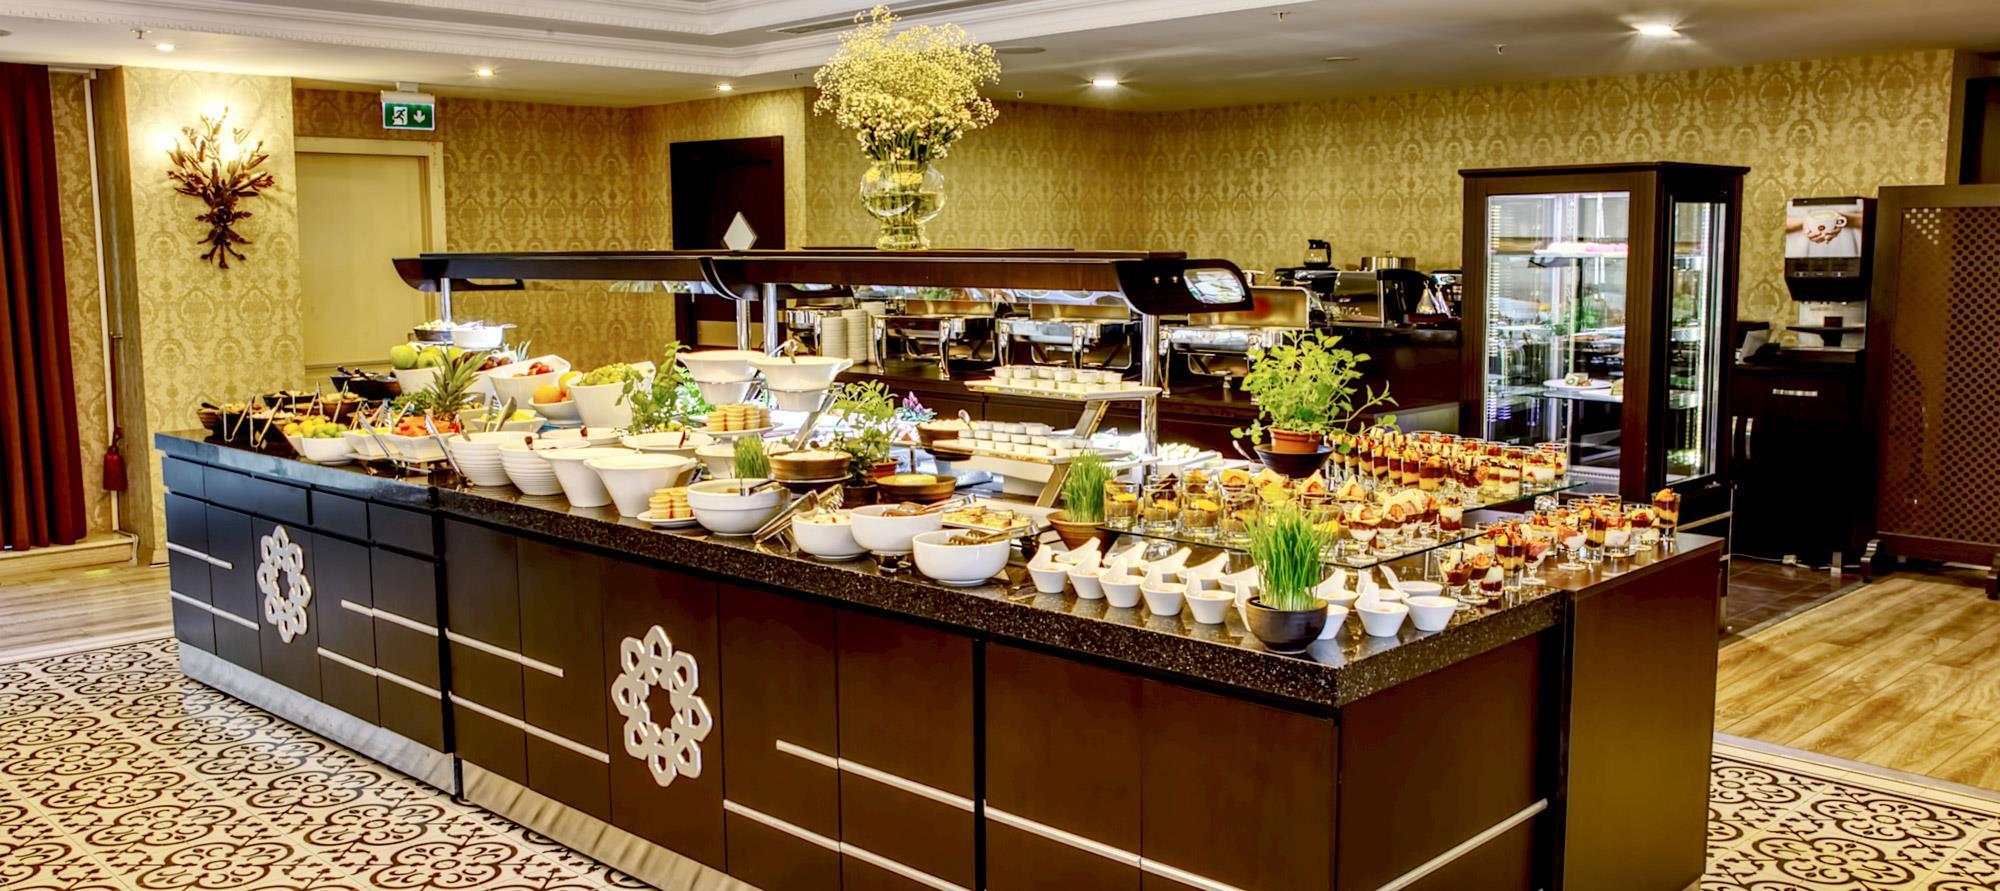 Grand Makel Hotel Topkapi254621